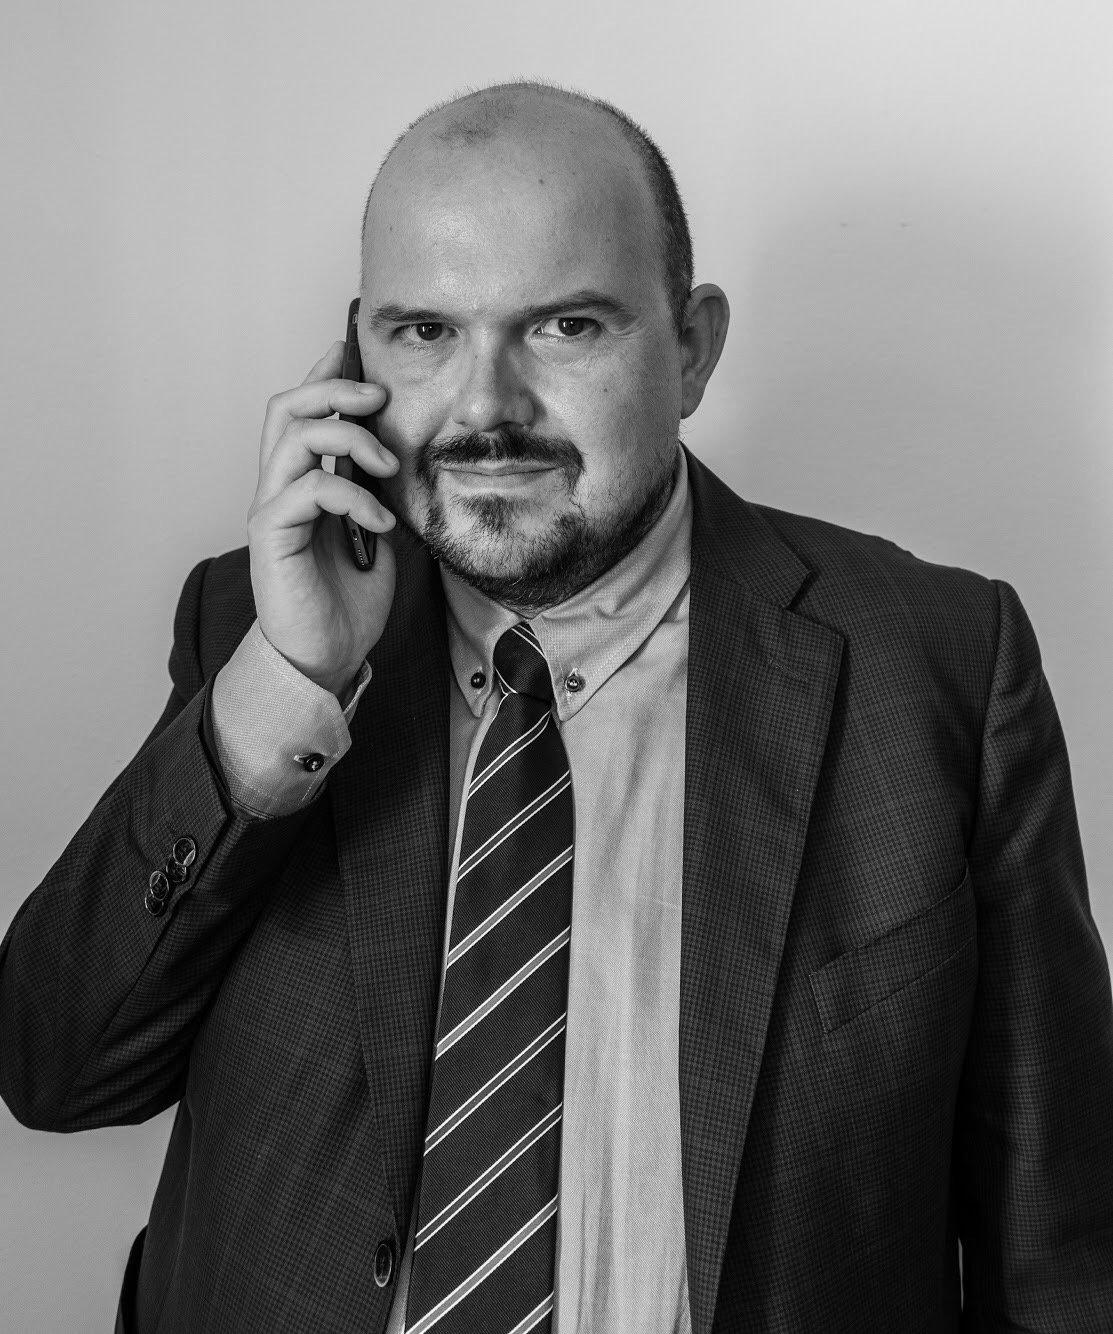 Avvocato a telefono